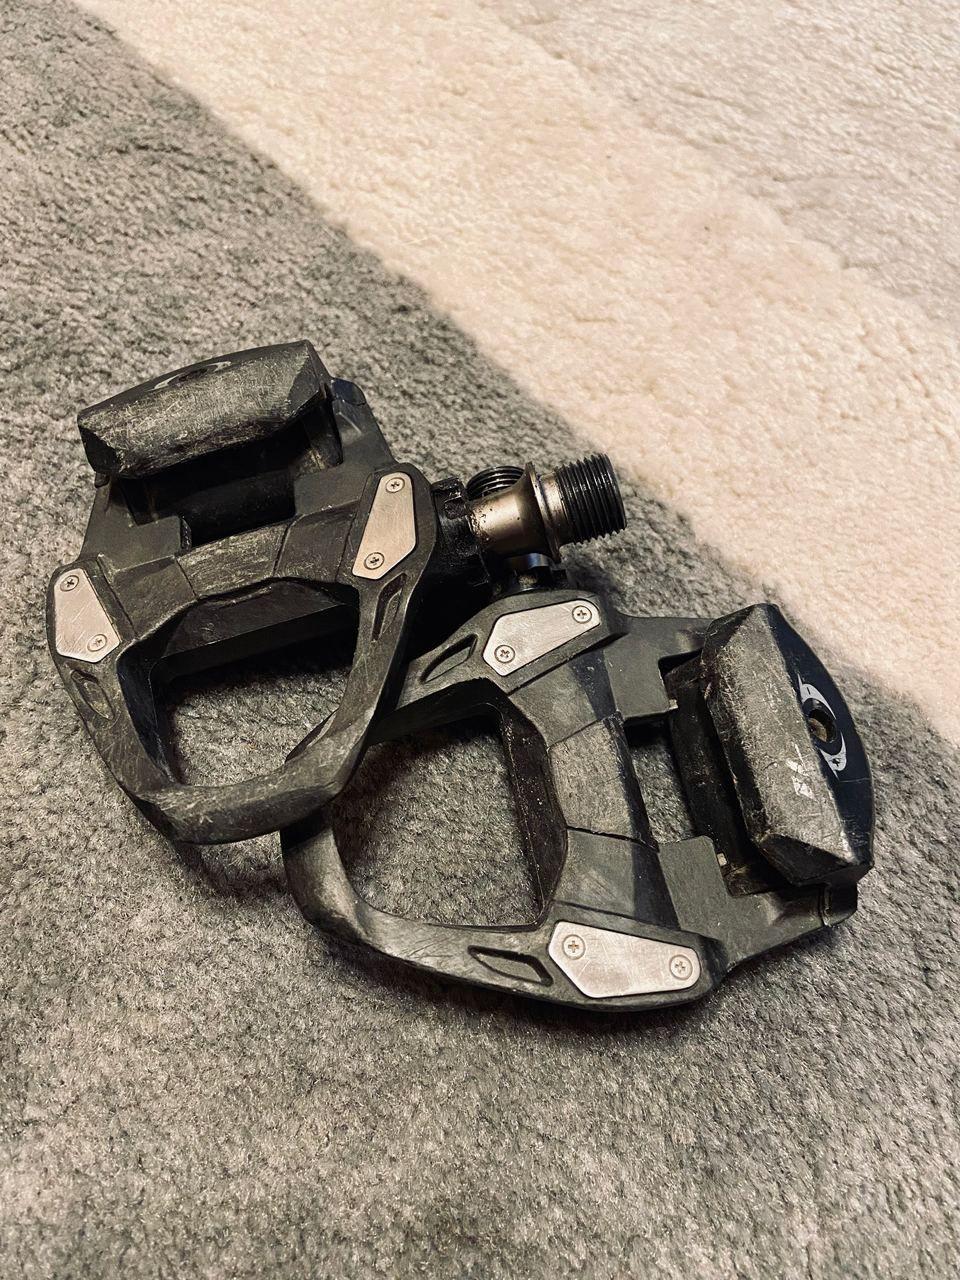 Туфли Specialized Torch 3.0 42 размера + педали Shimano 105 R7000